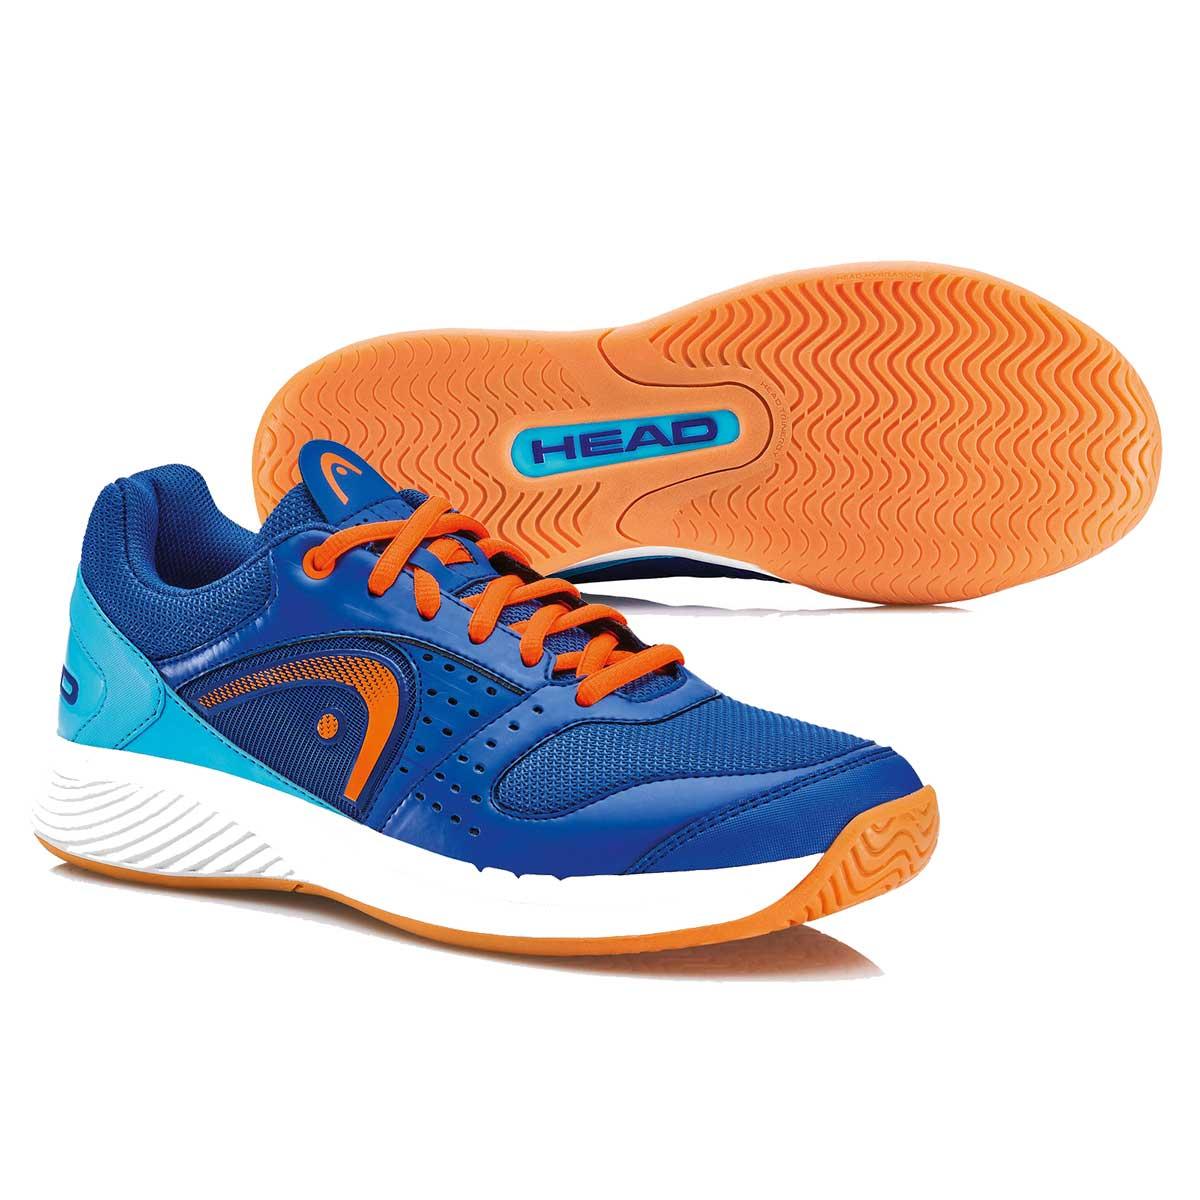 Buy Head Sprint Team Indoor Squash Shoes Blue Orange Online